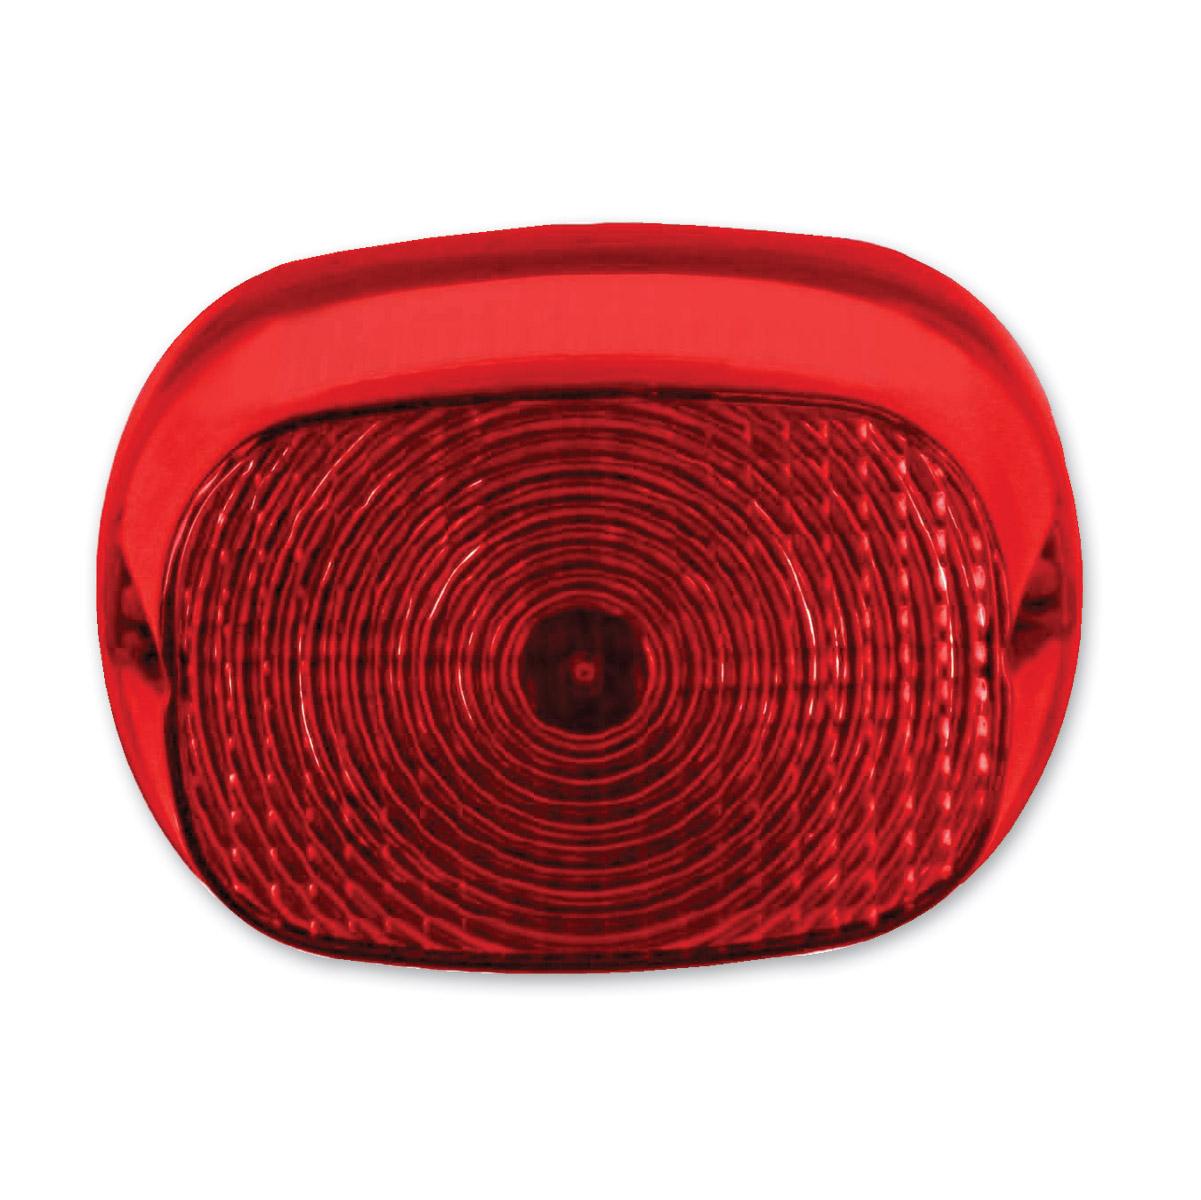 Custom Dynamics Squareback LED Taillight w/out Illumination Window